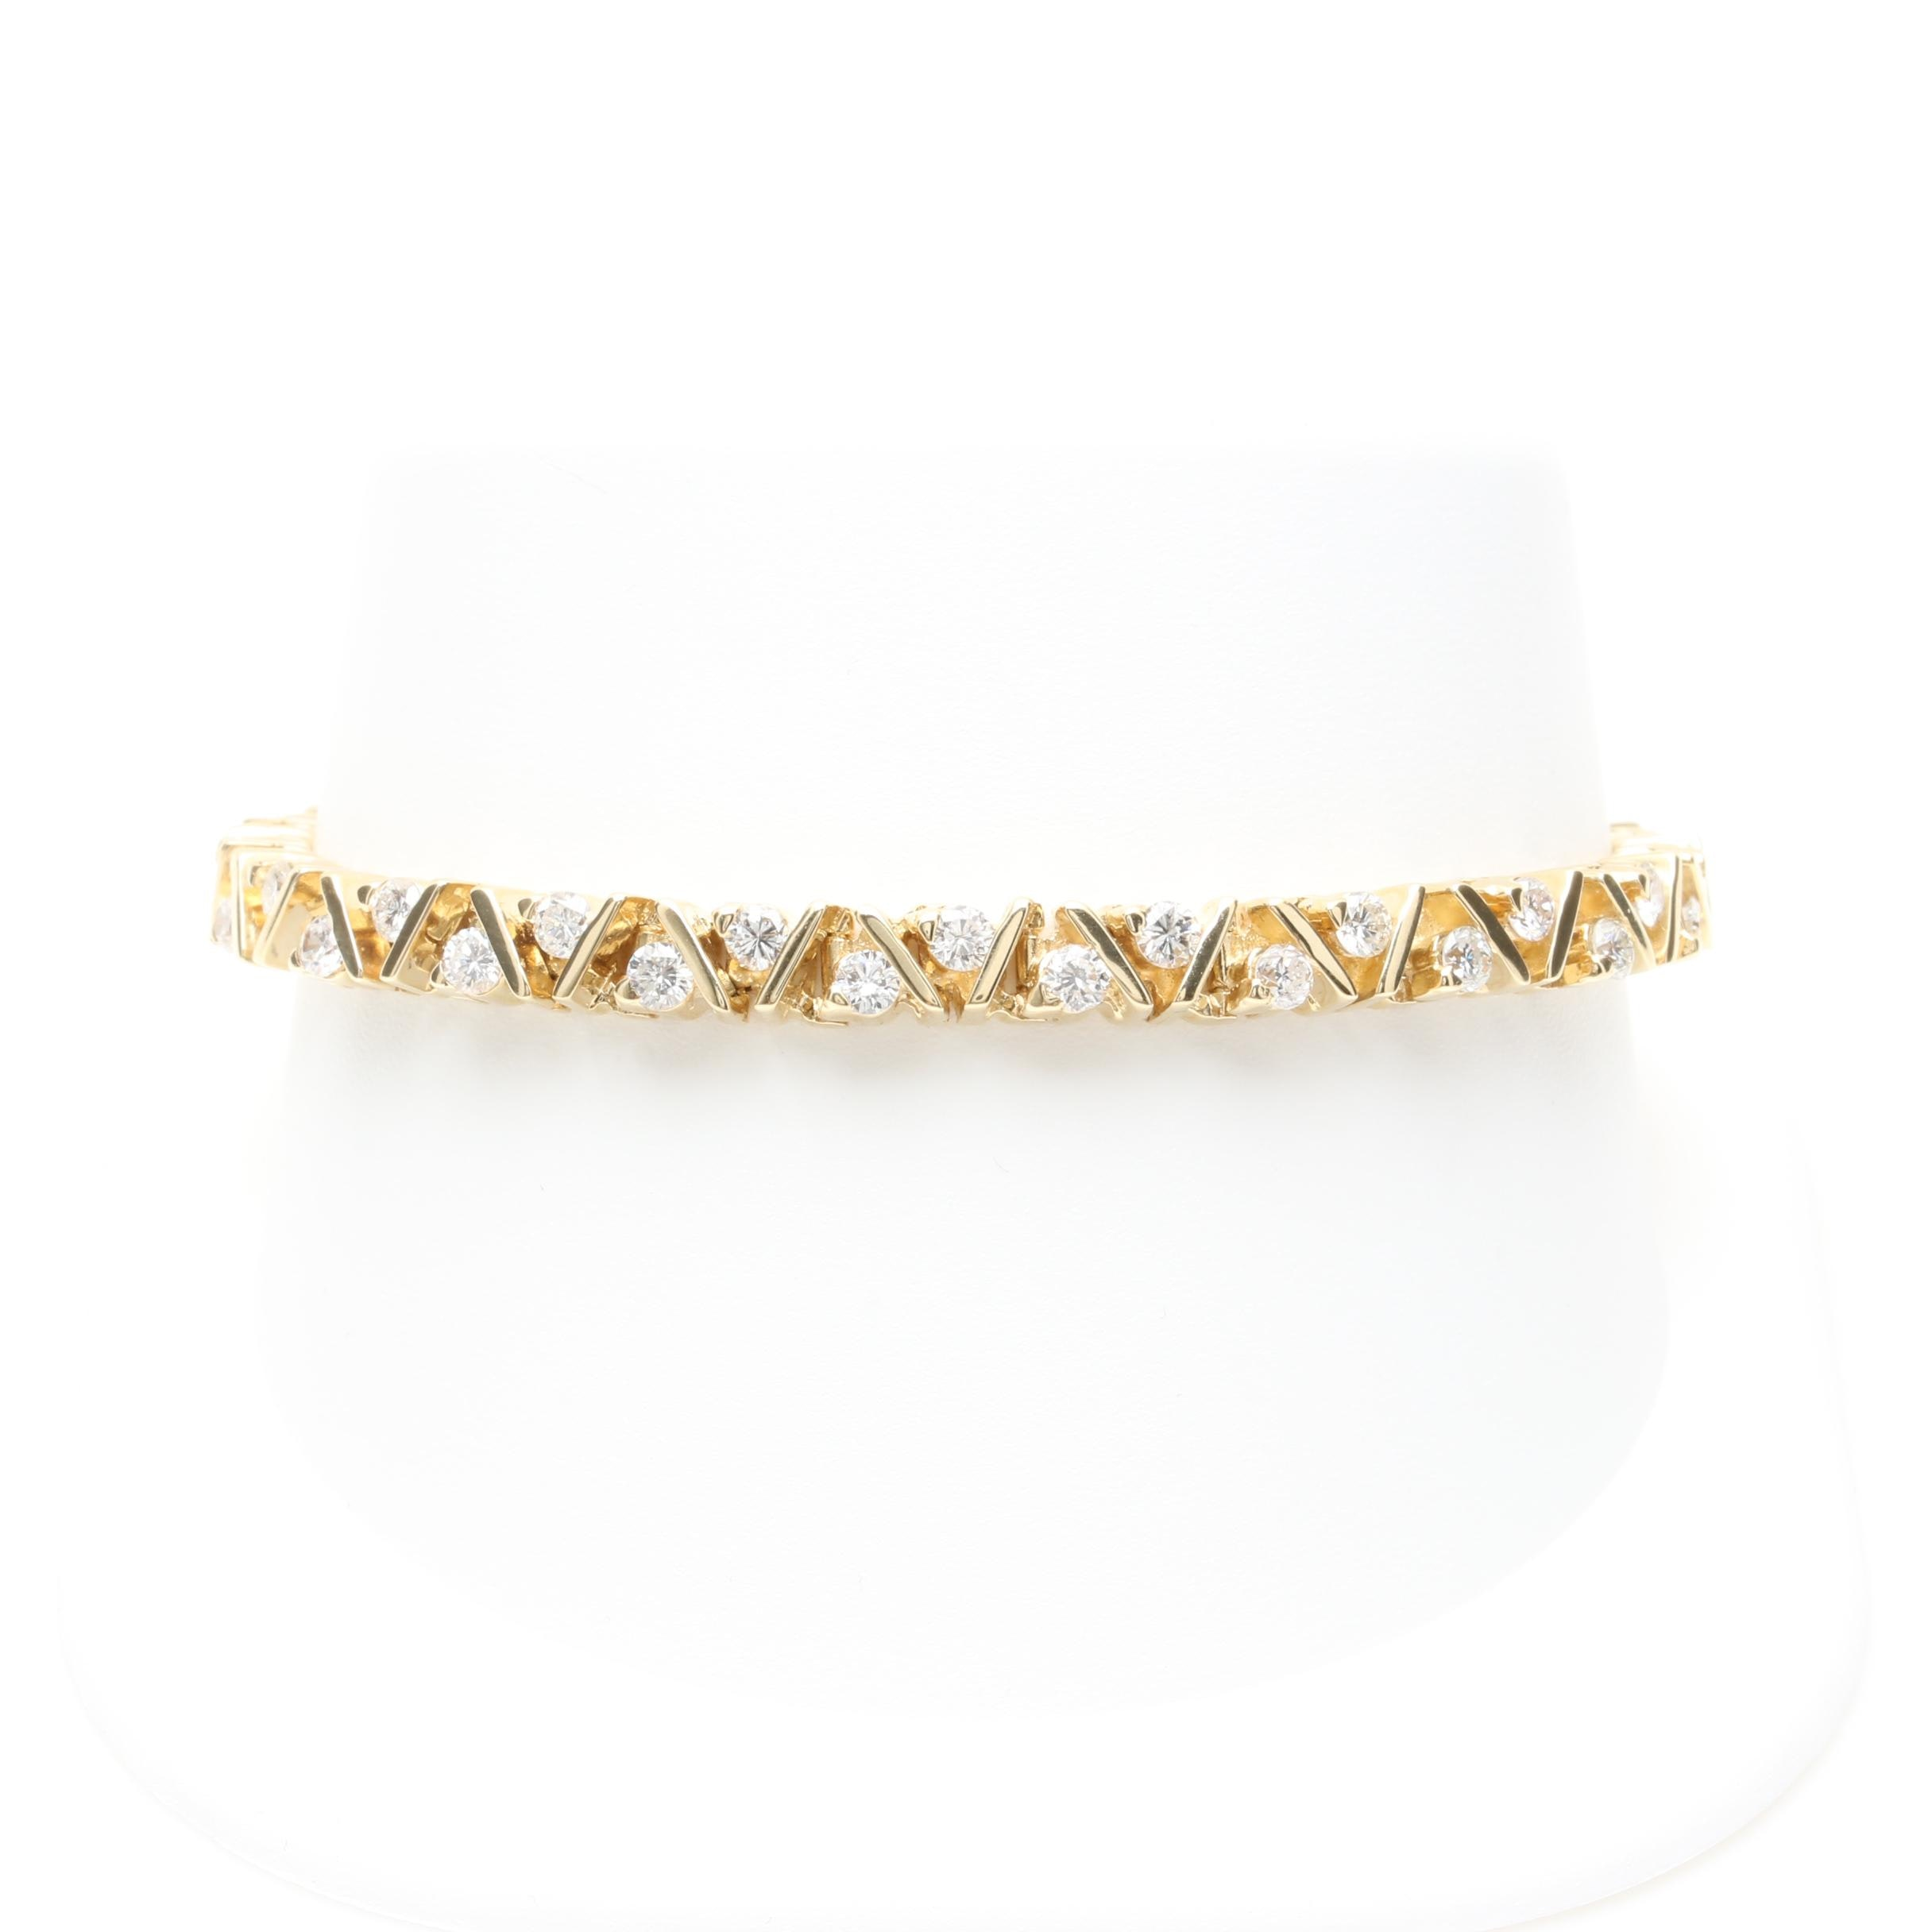 18K and 14K Yellow Gold 3.57 CTW Diamond Bracelet